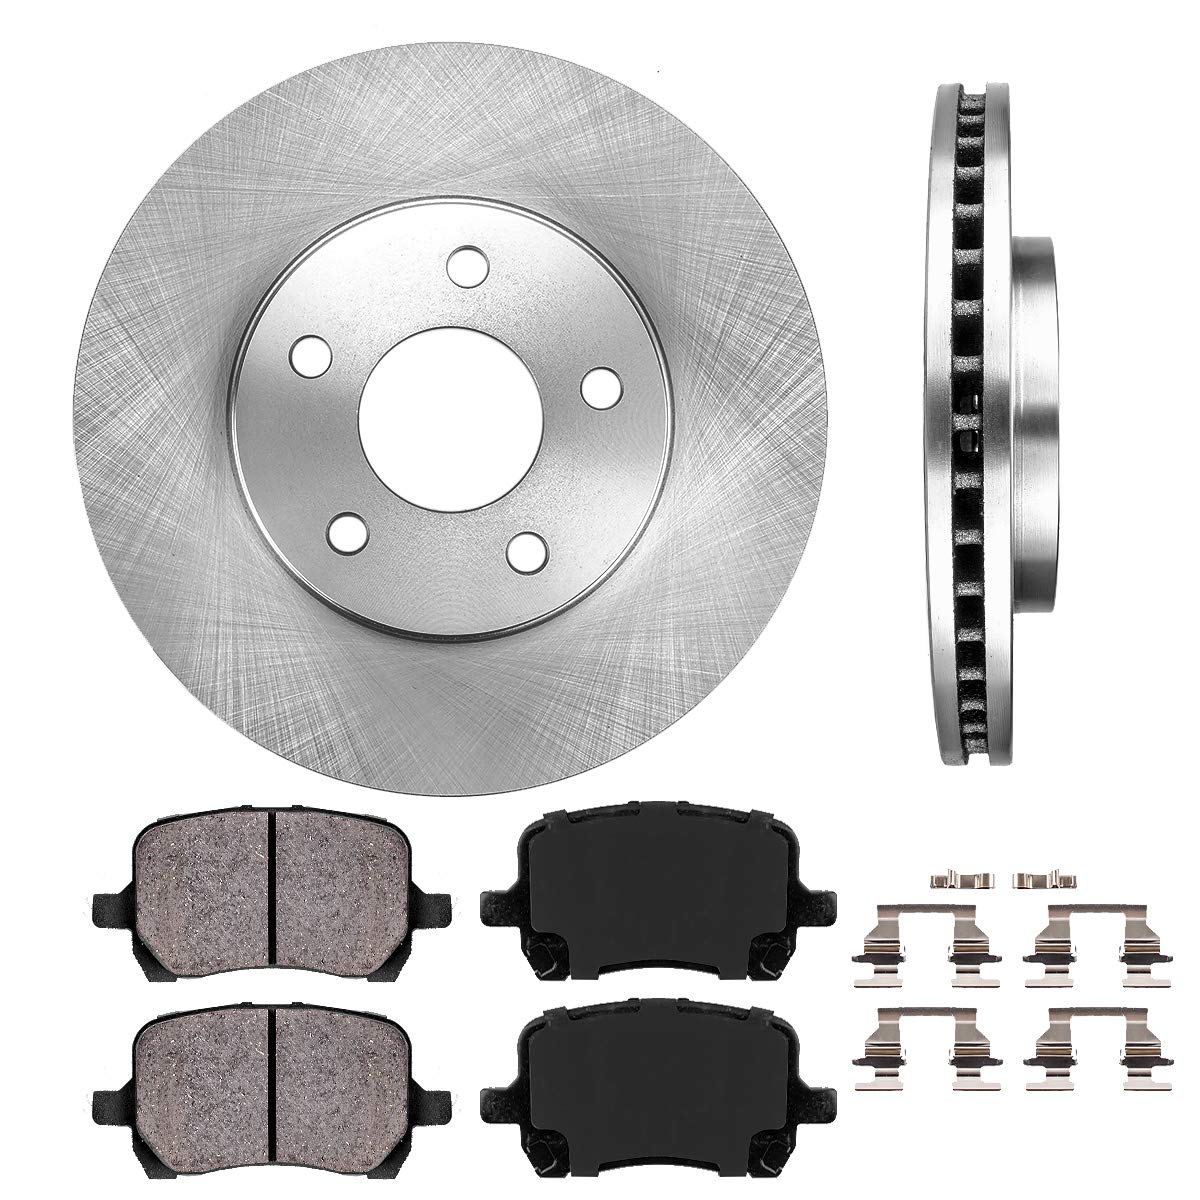 FRONT 276 mm Premium OE 5 Lug [2] Brake Disc Rotors + [4] Ceramic Brake Pads + Clips